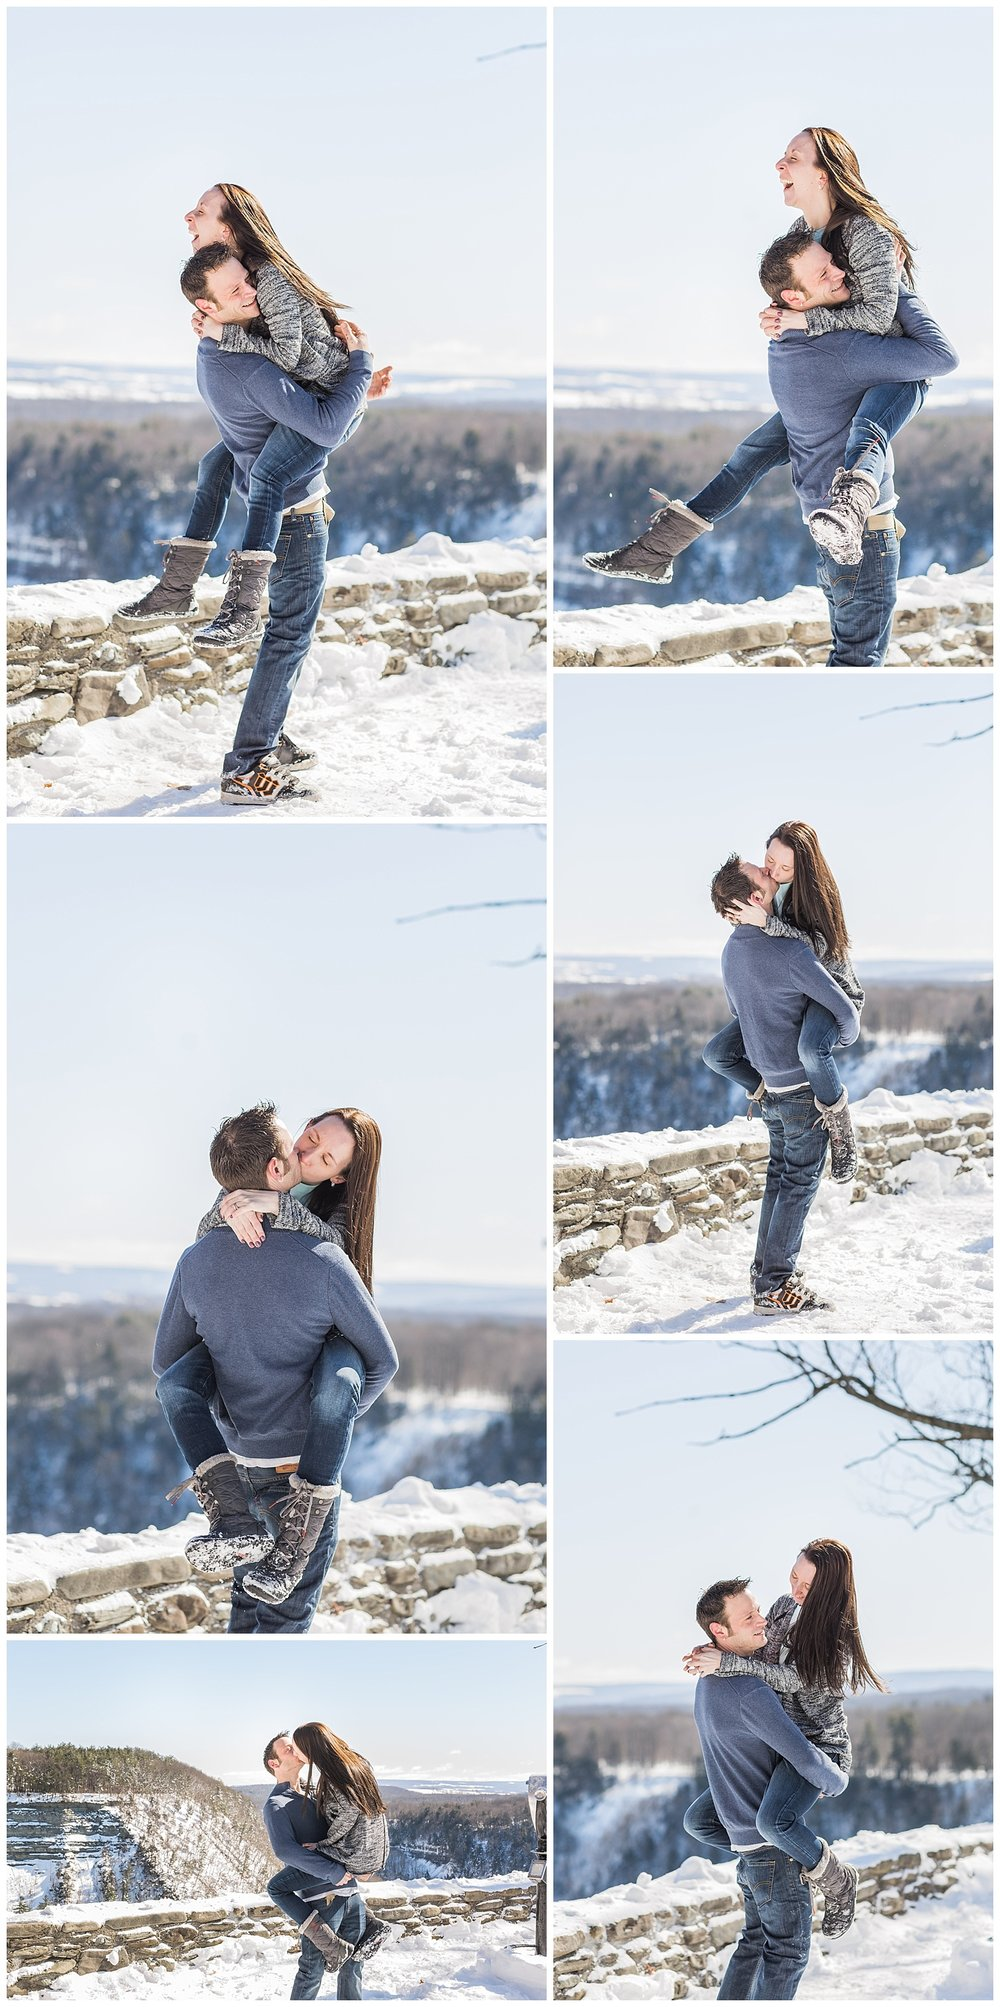 Matt and Jessica - Winter in Letchworth -144_Buffalo wedding photography.jpg